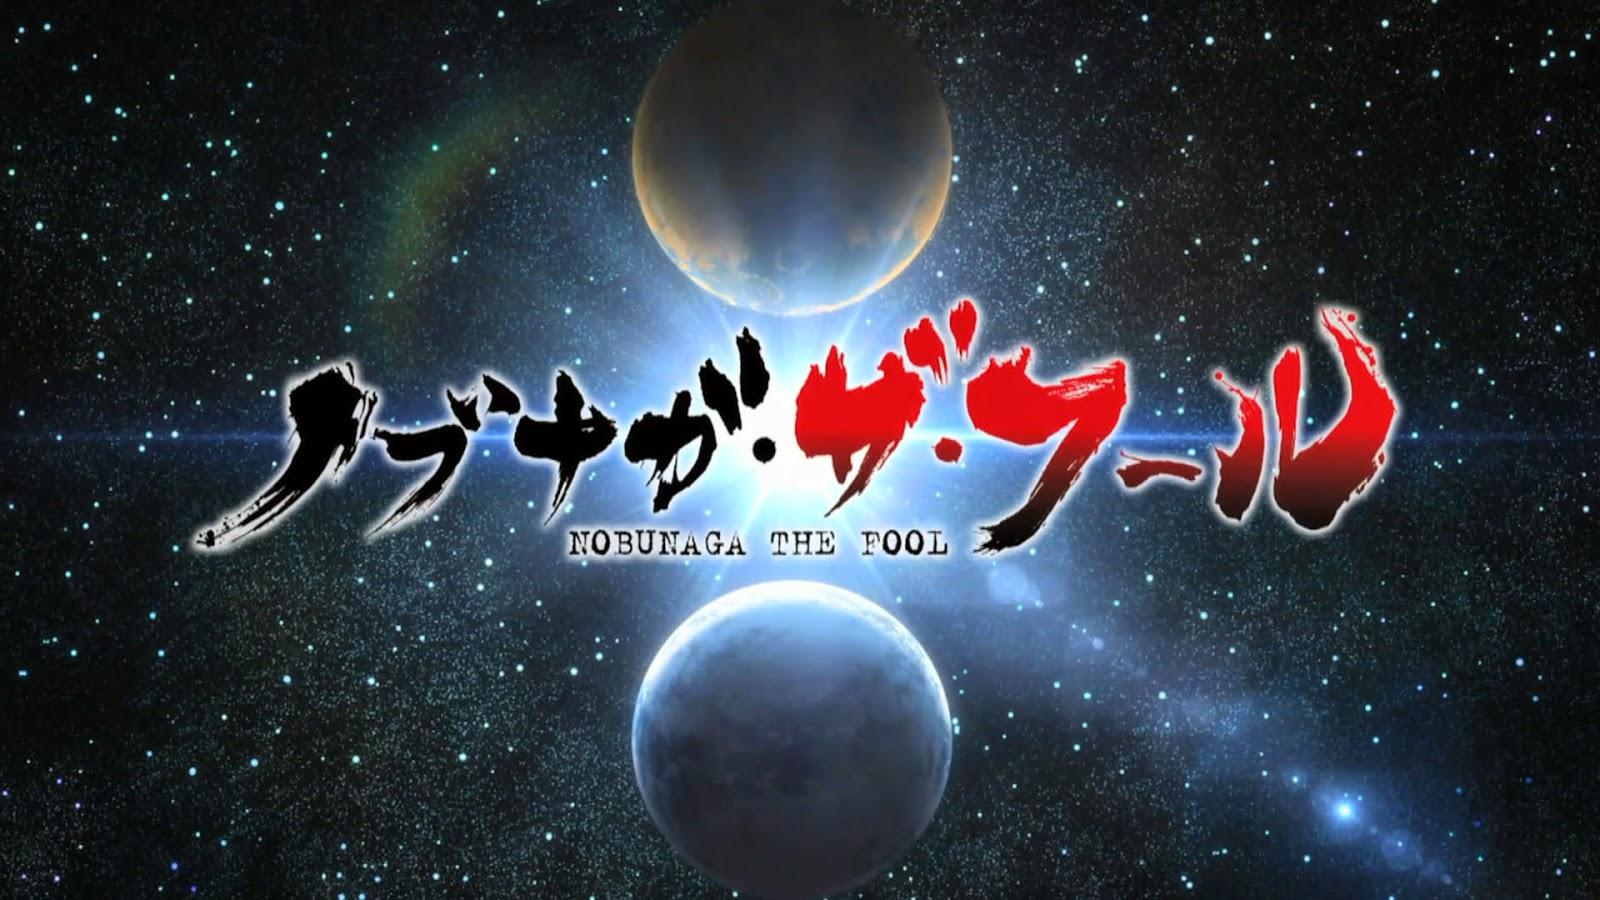 Nobunaga the Fool Subtitle Indonesia [Batch]